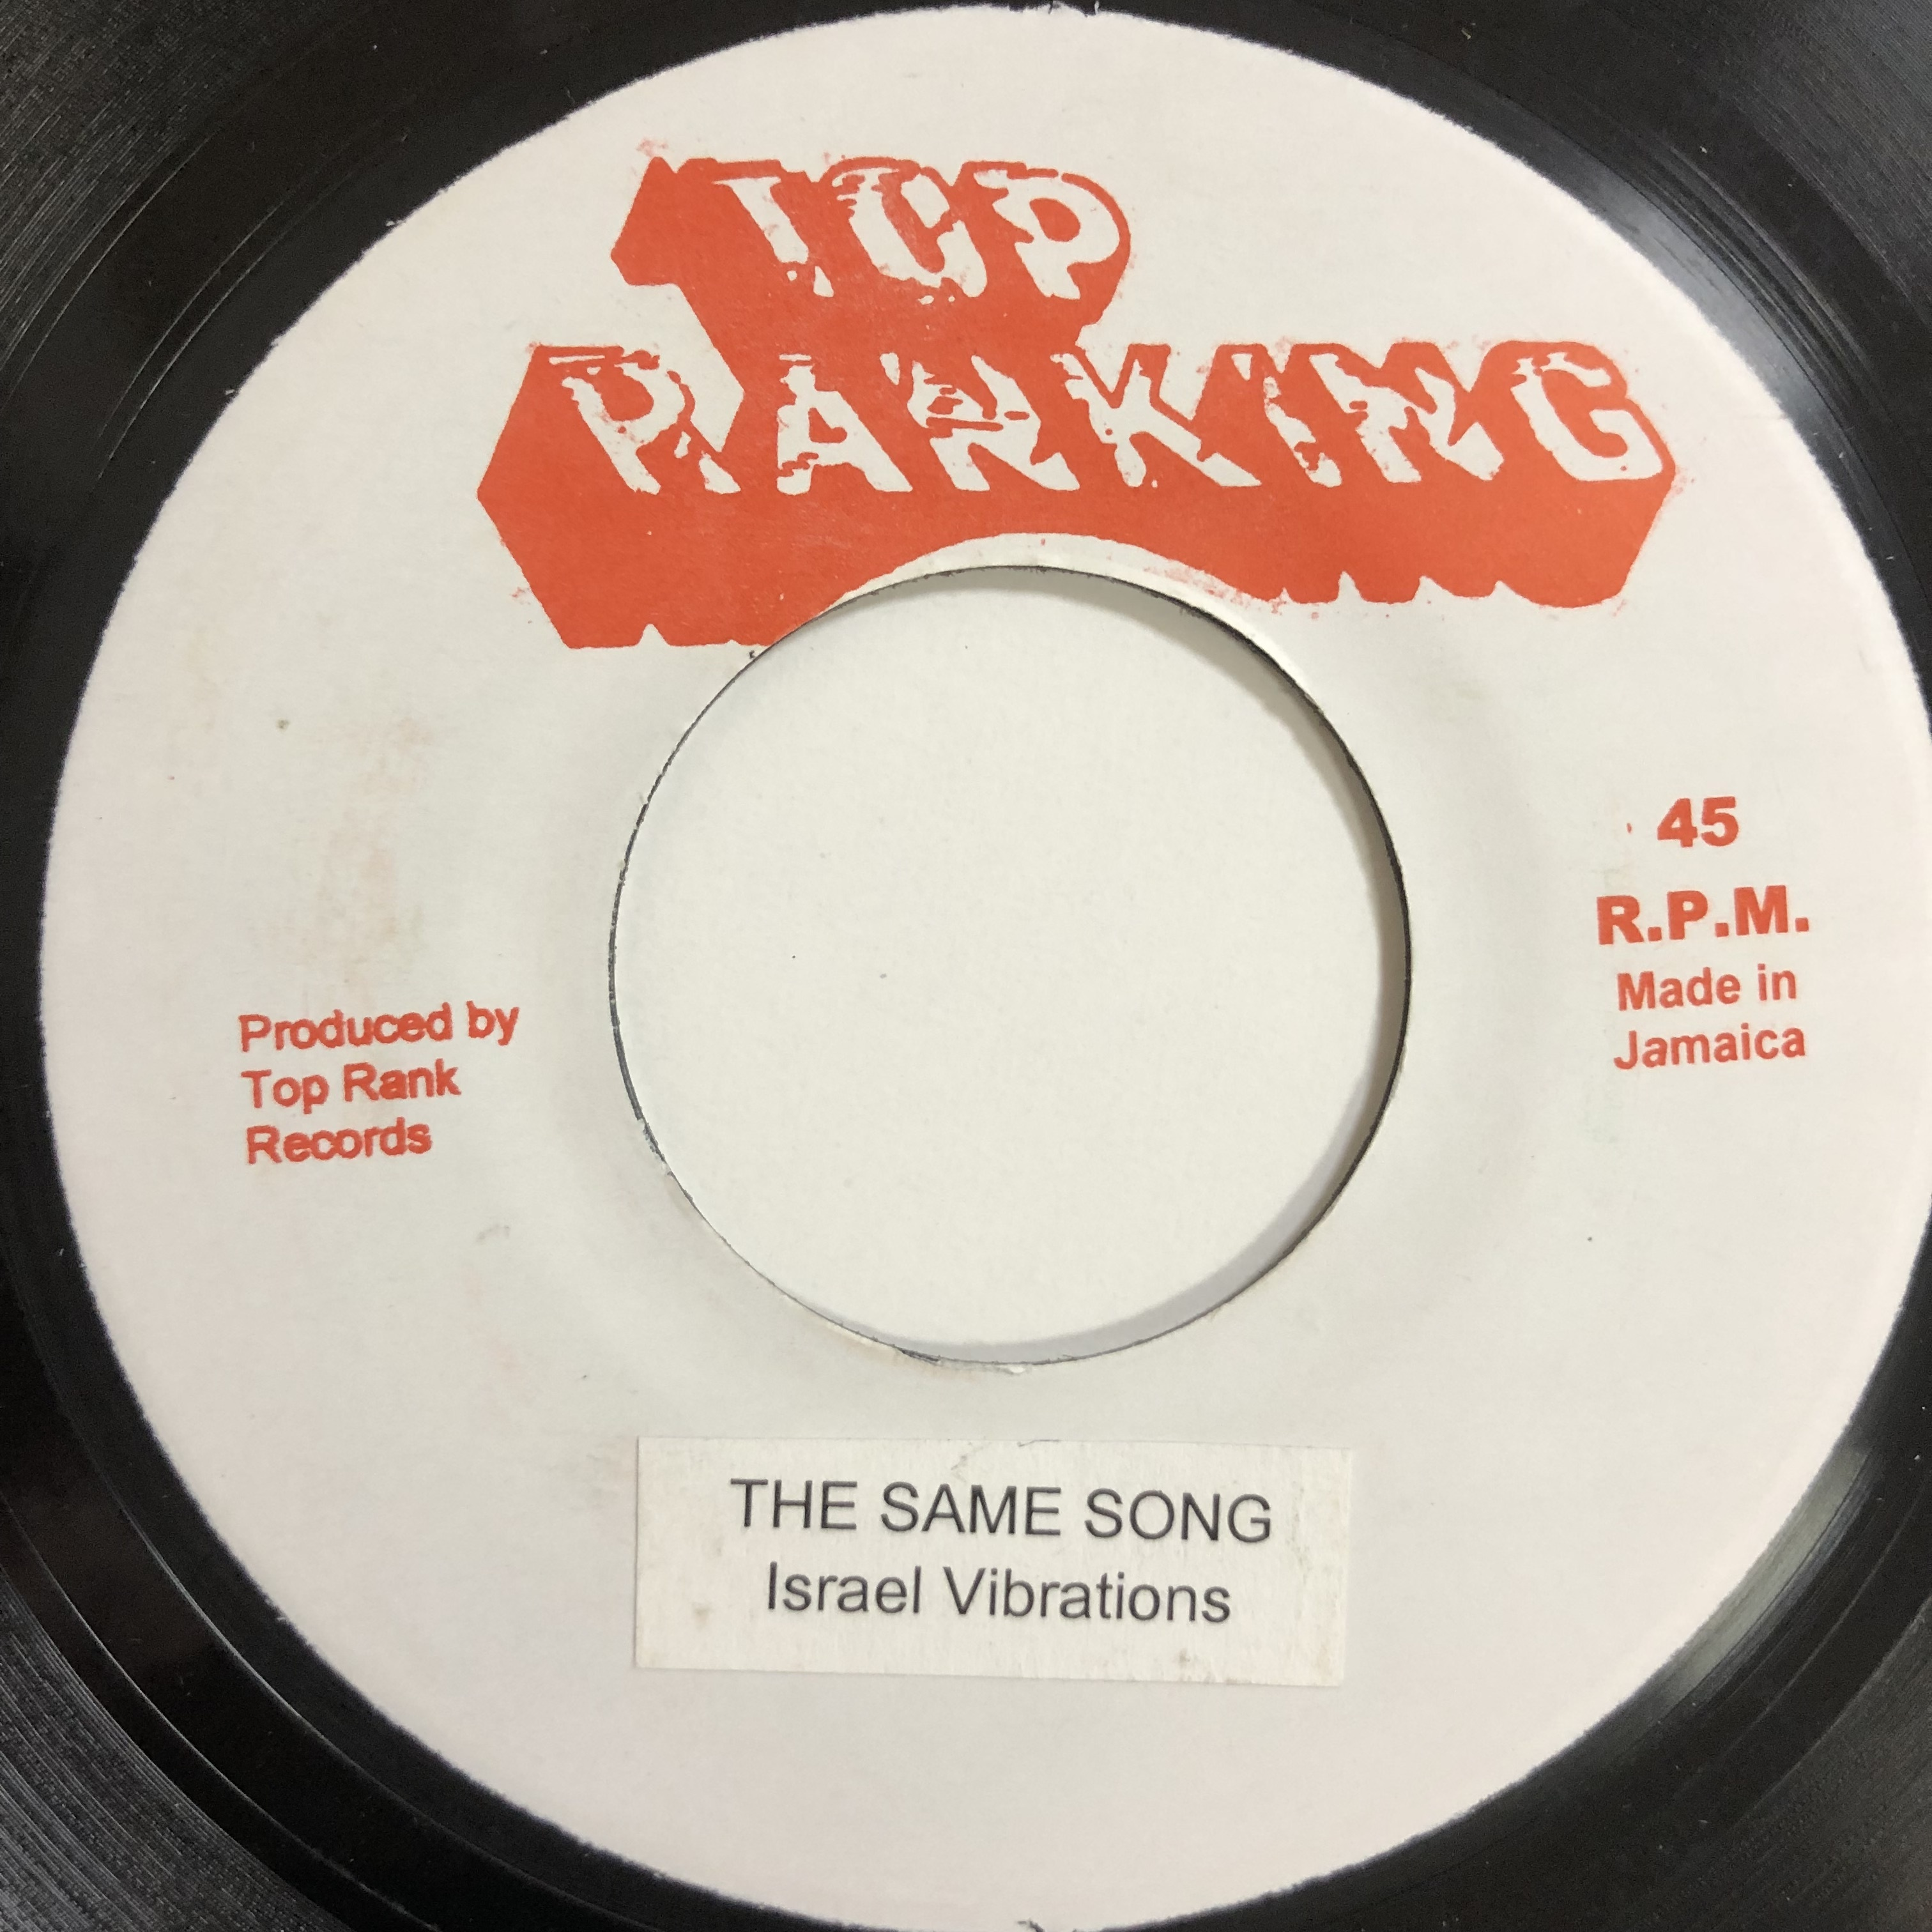 Israel Vibration(イスラエルバイブレーション) - The Same Song【7-20140】